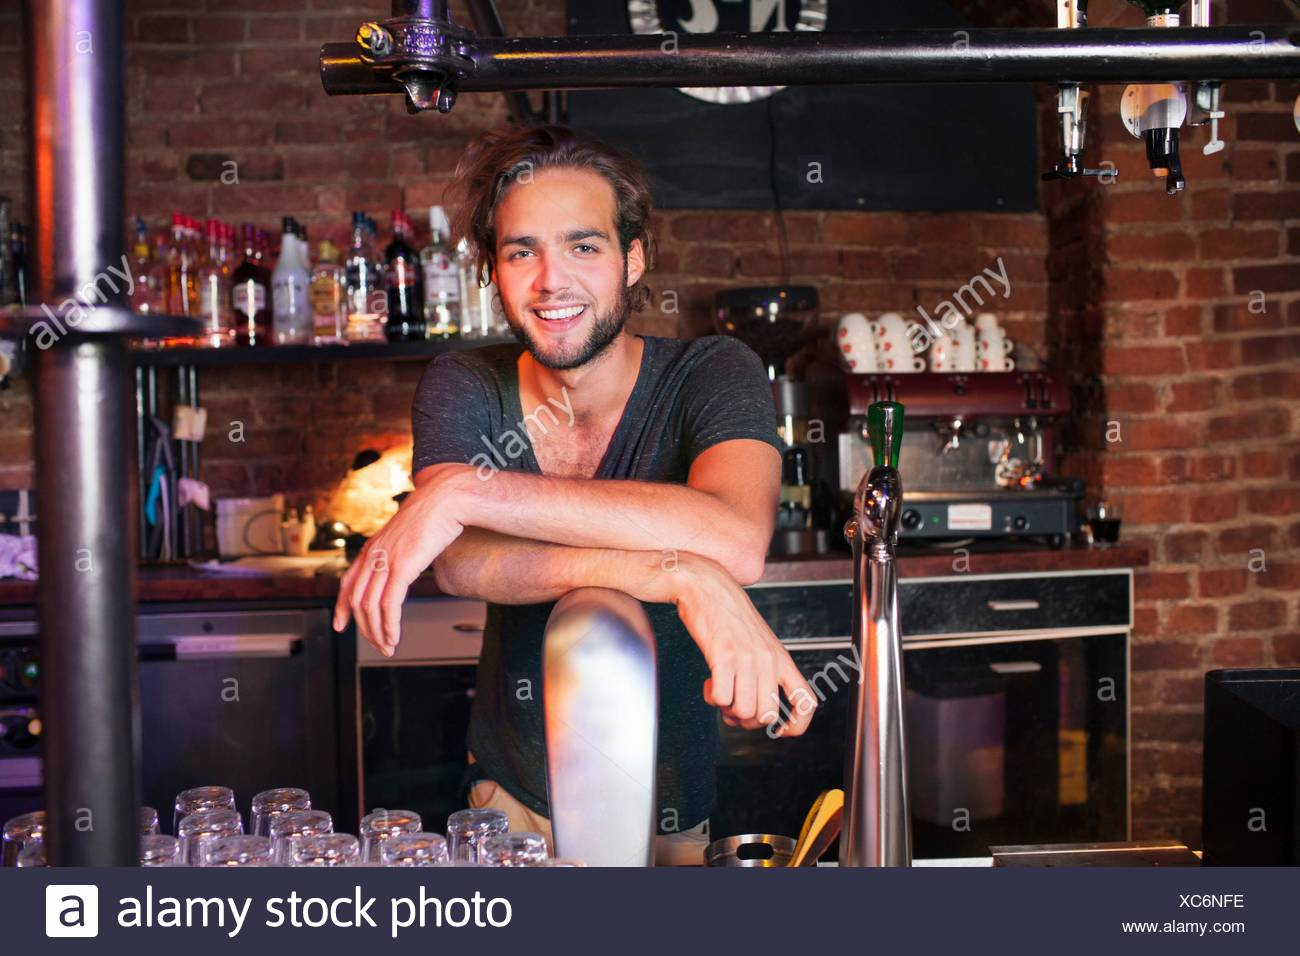 dating mann bartender hastighet dating Richland Washington